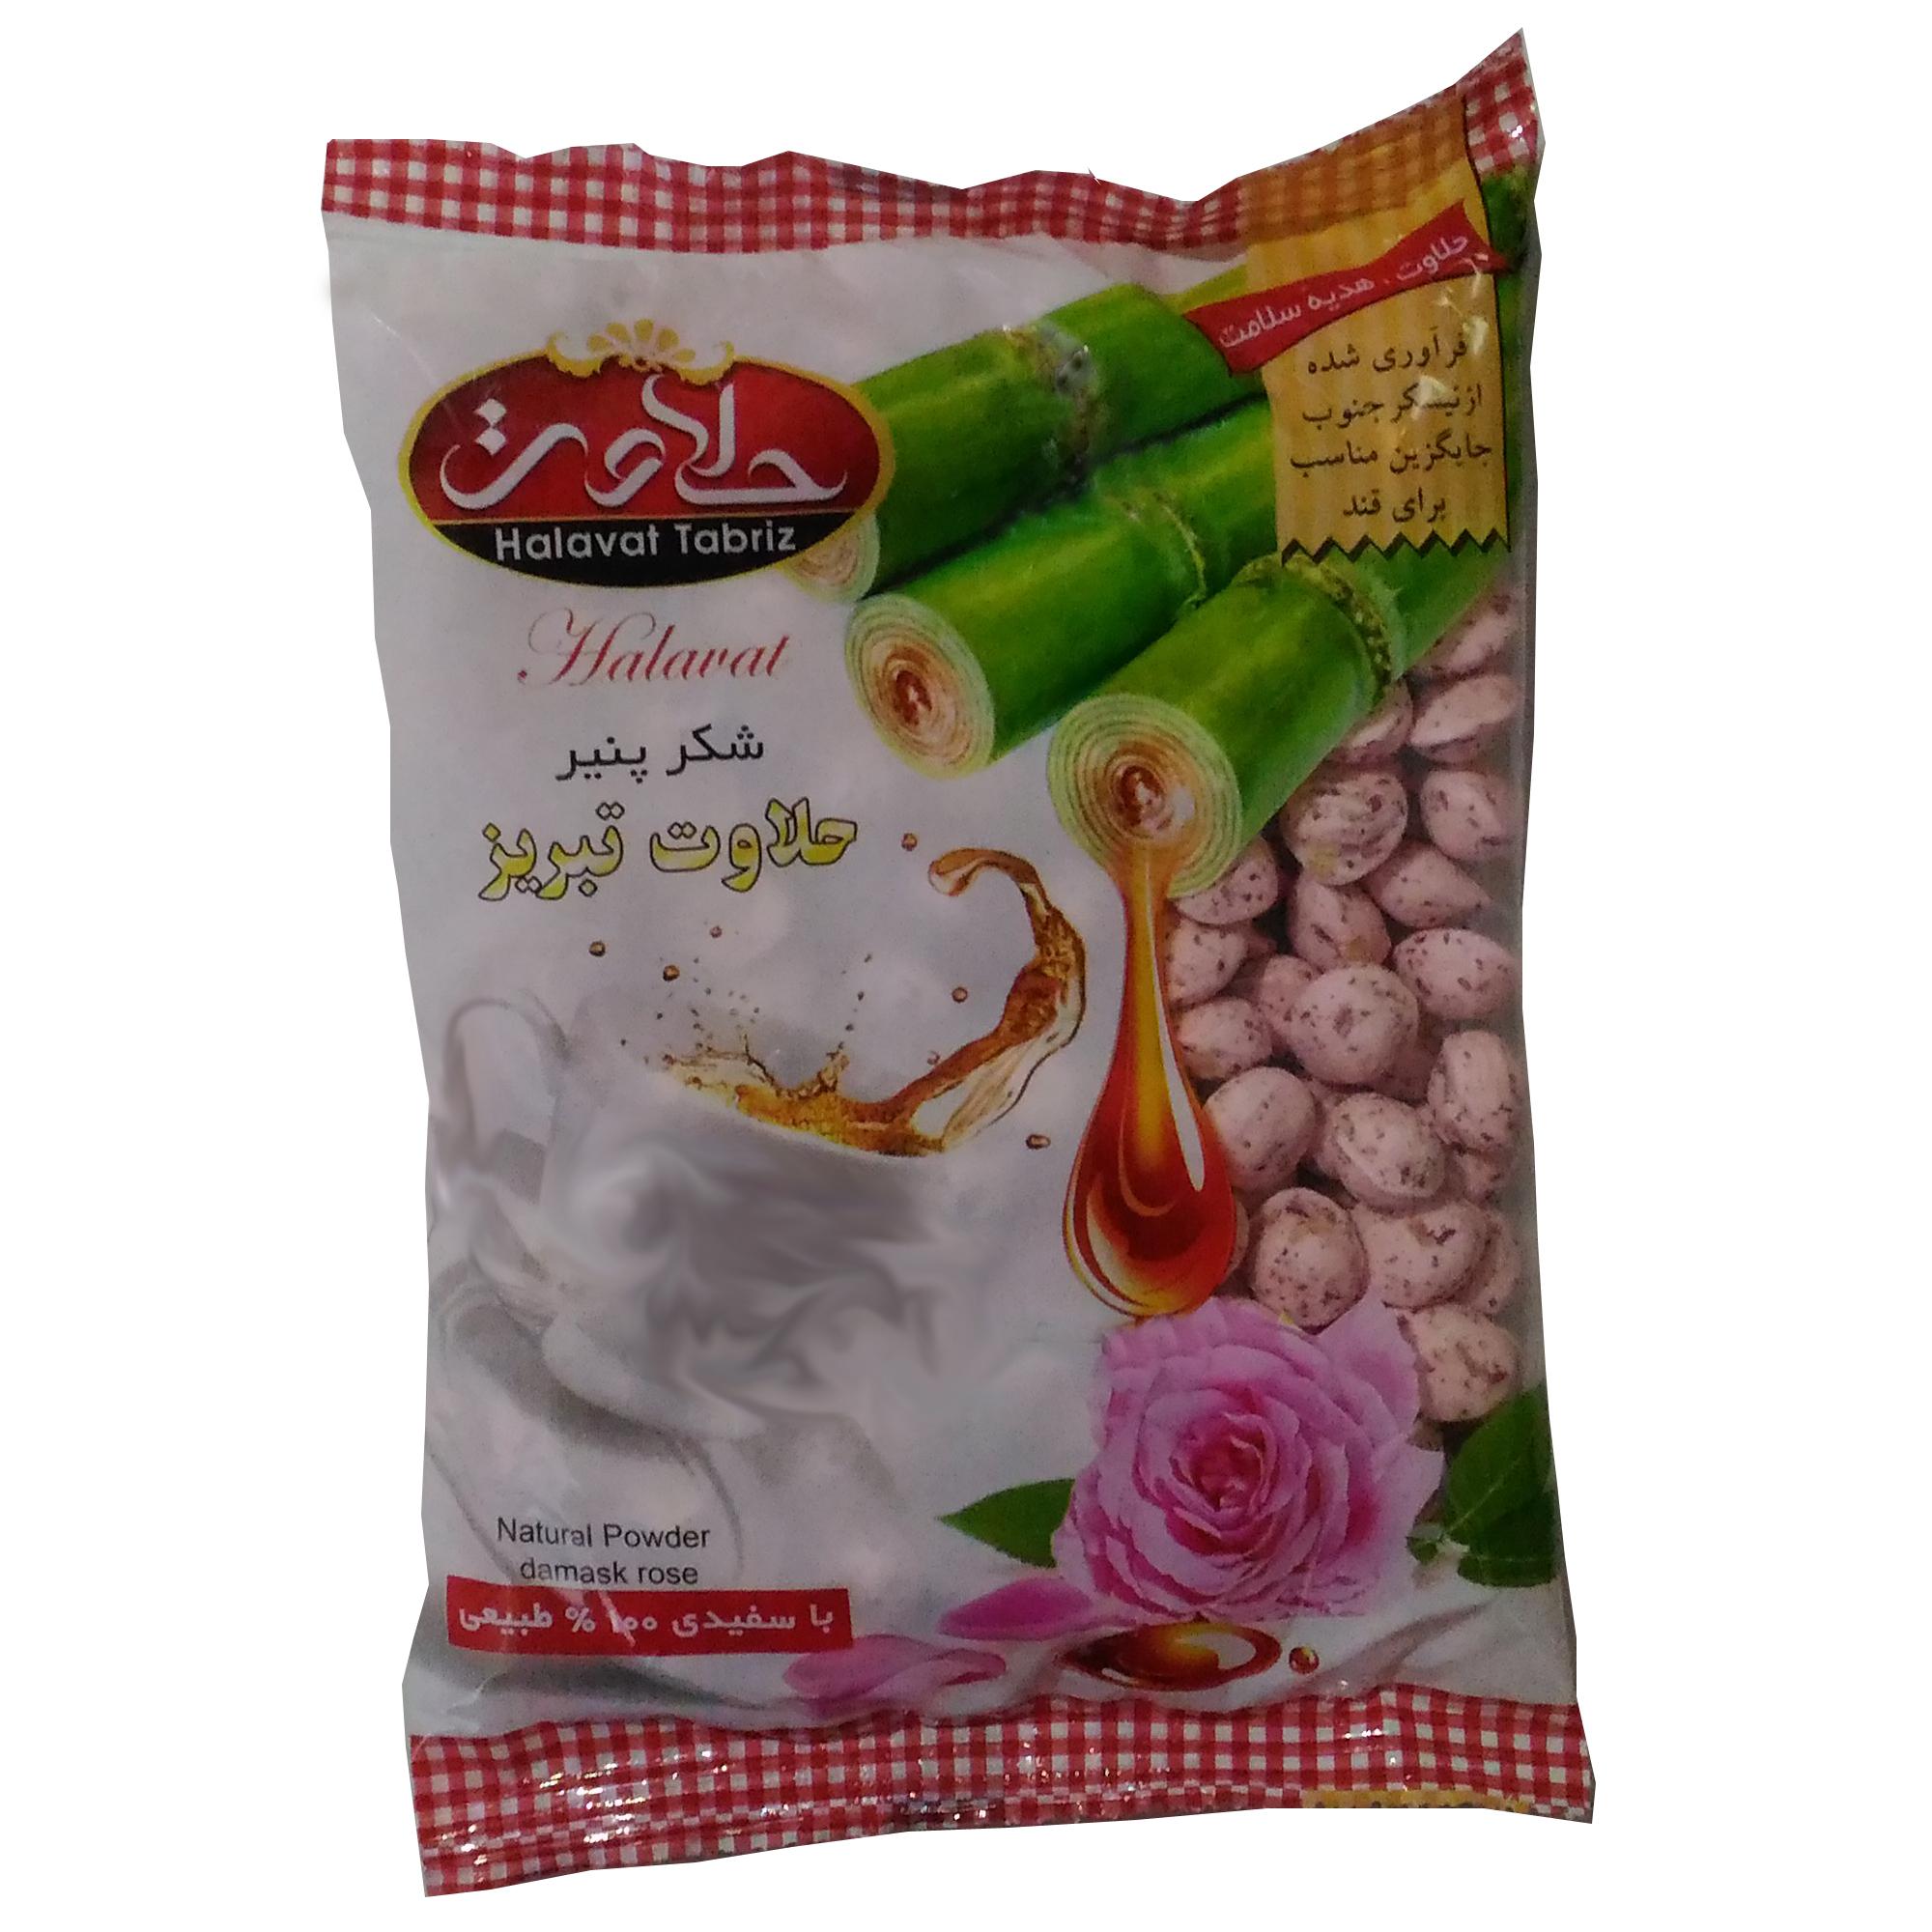 شکر پنیر طبیعی  گل محمدی حلاوت تبریز - 350 گرم